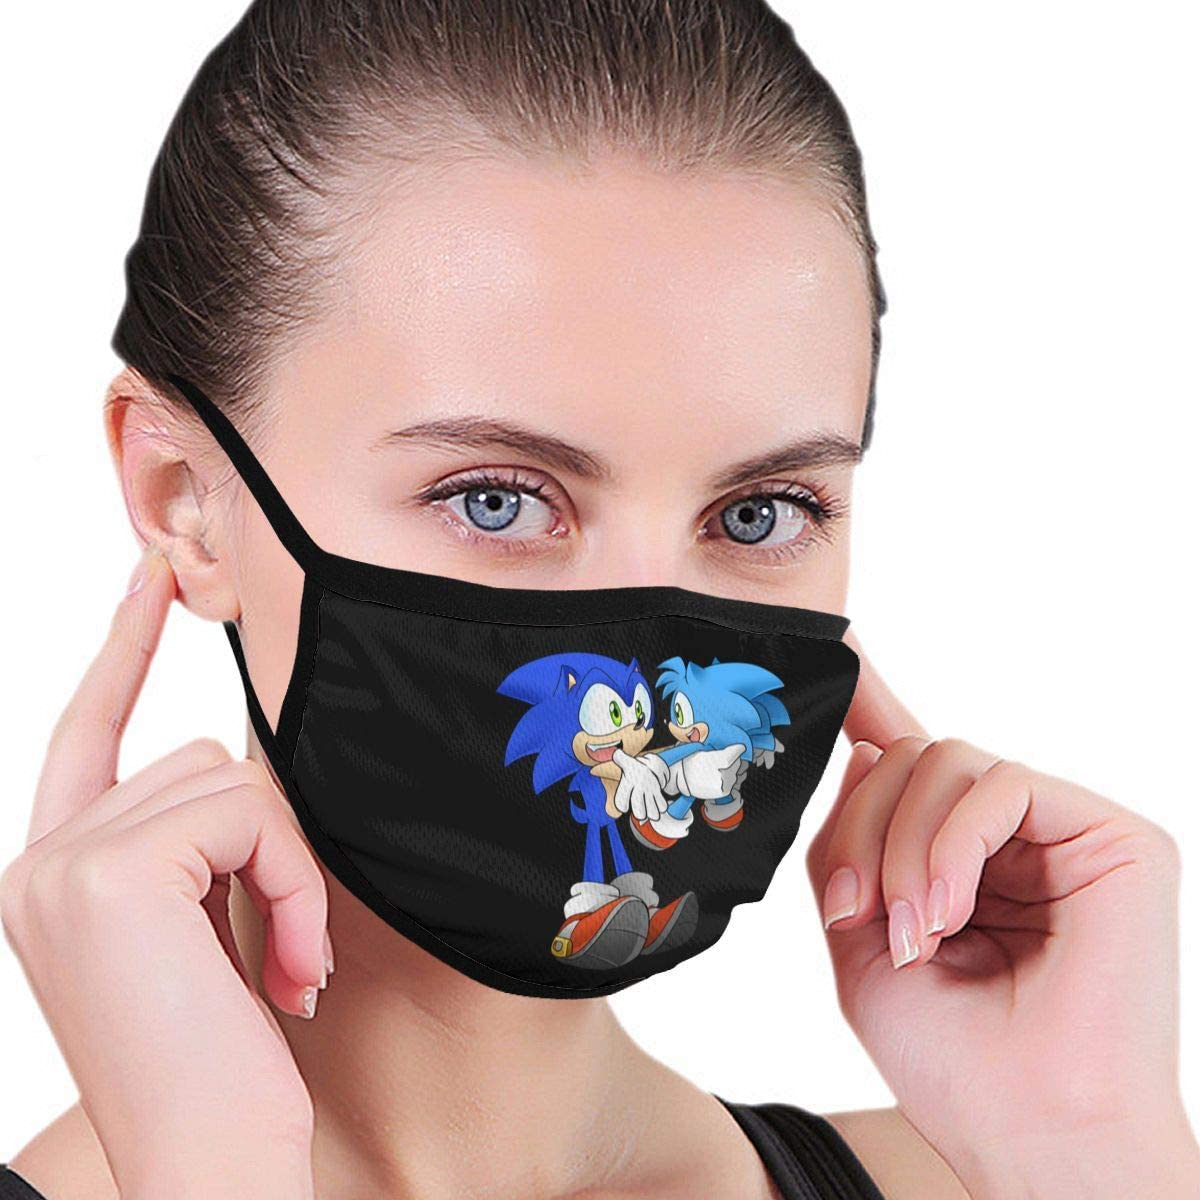 Qwtykeertyi Sonic The Hedgehog Fashion Protective Reusable Unisex Black Cotton Washable Balaclava